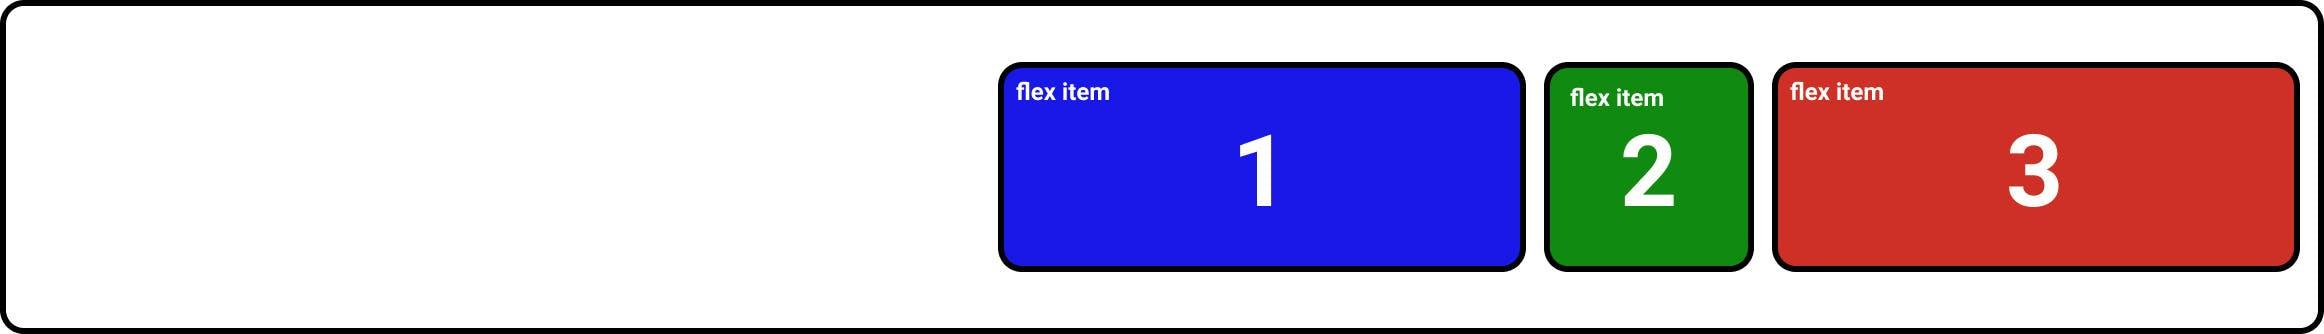 CSS flexbox justify-content: flex-end;